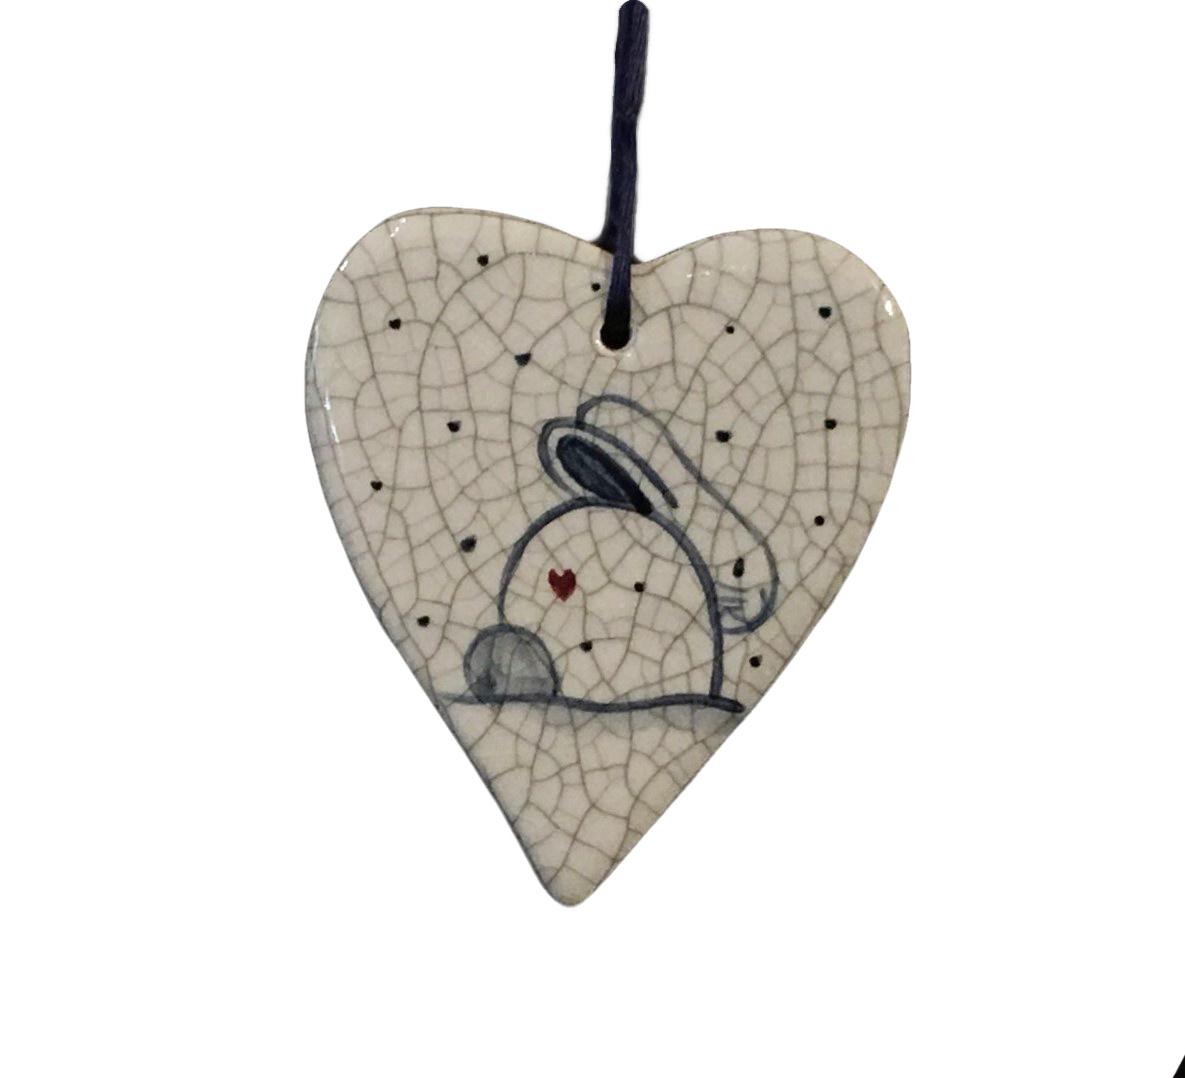 RABBIT HEART-1